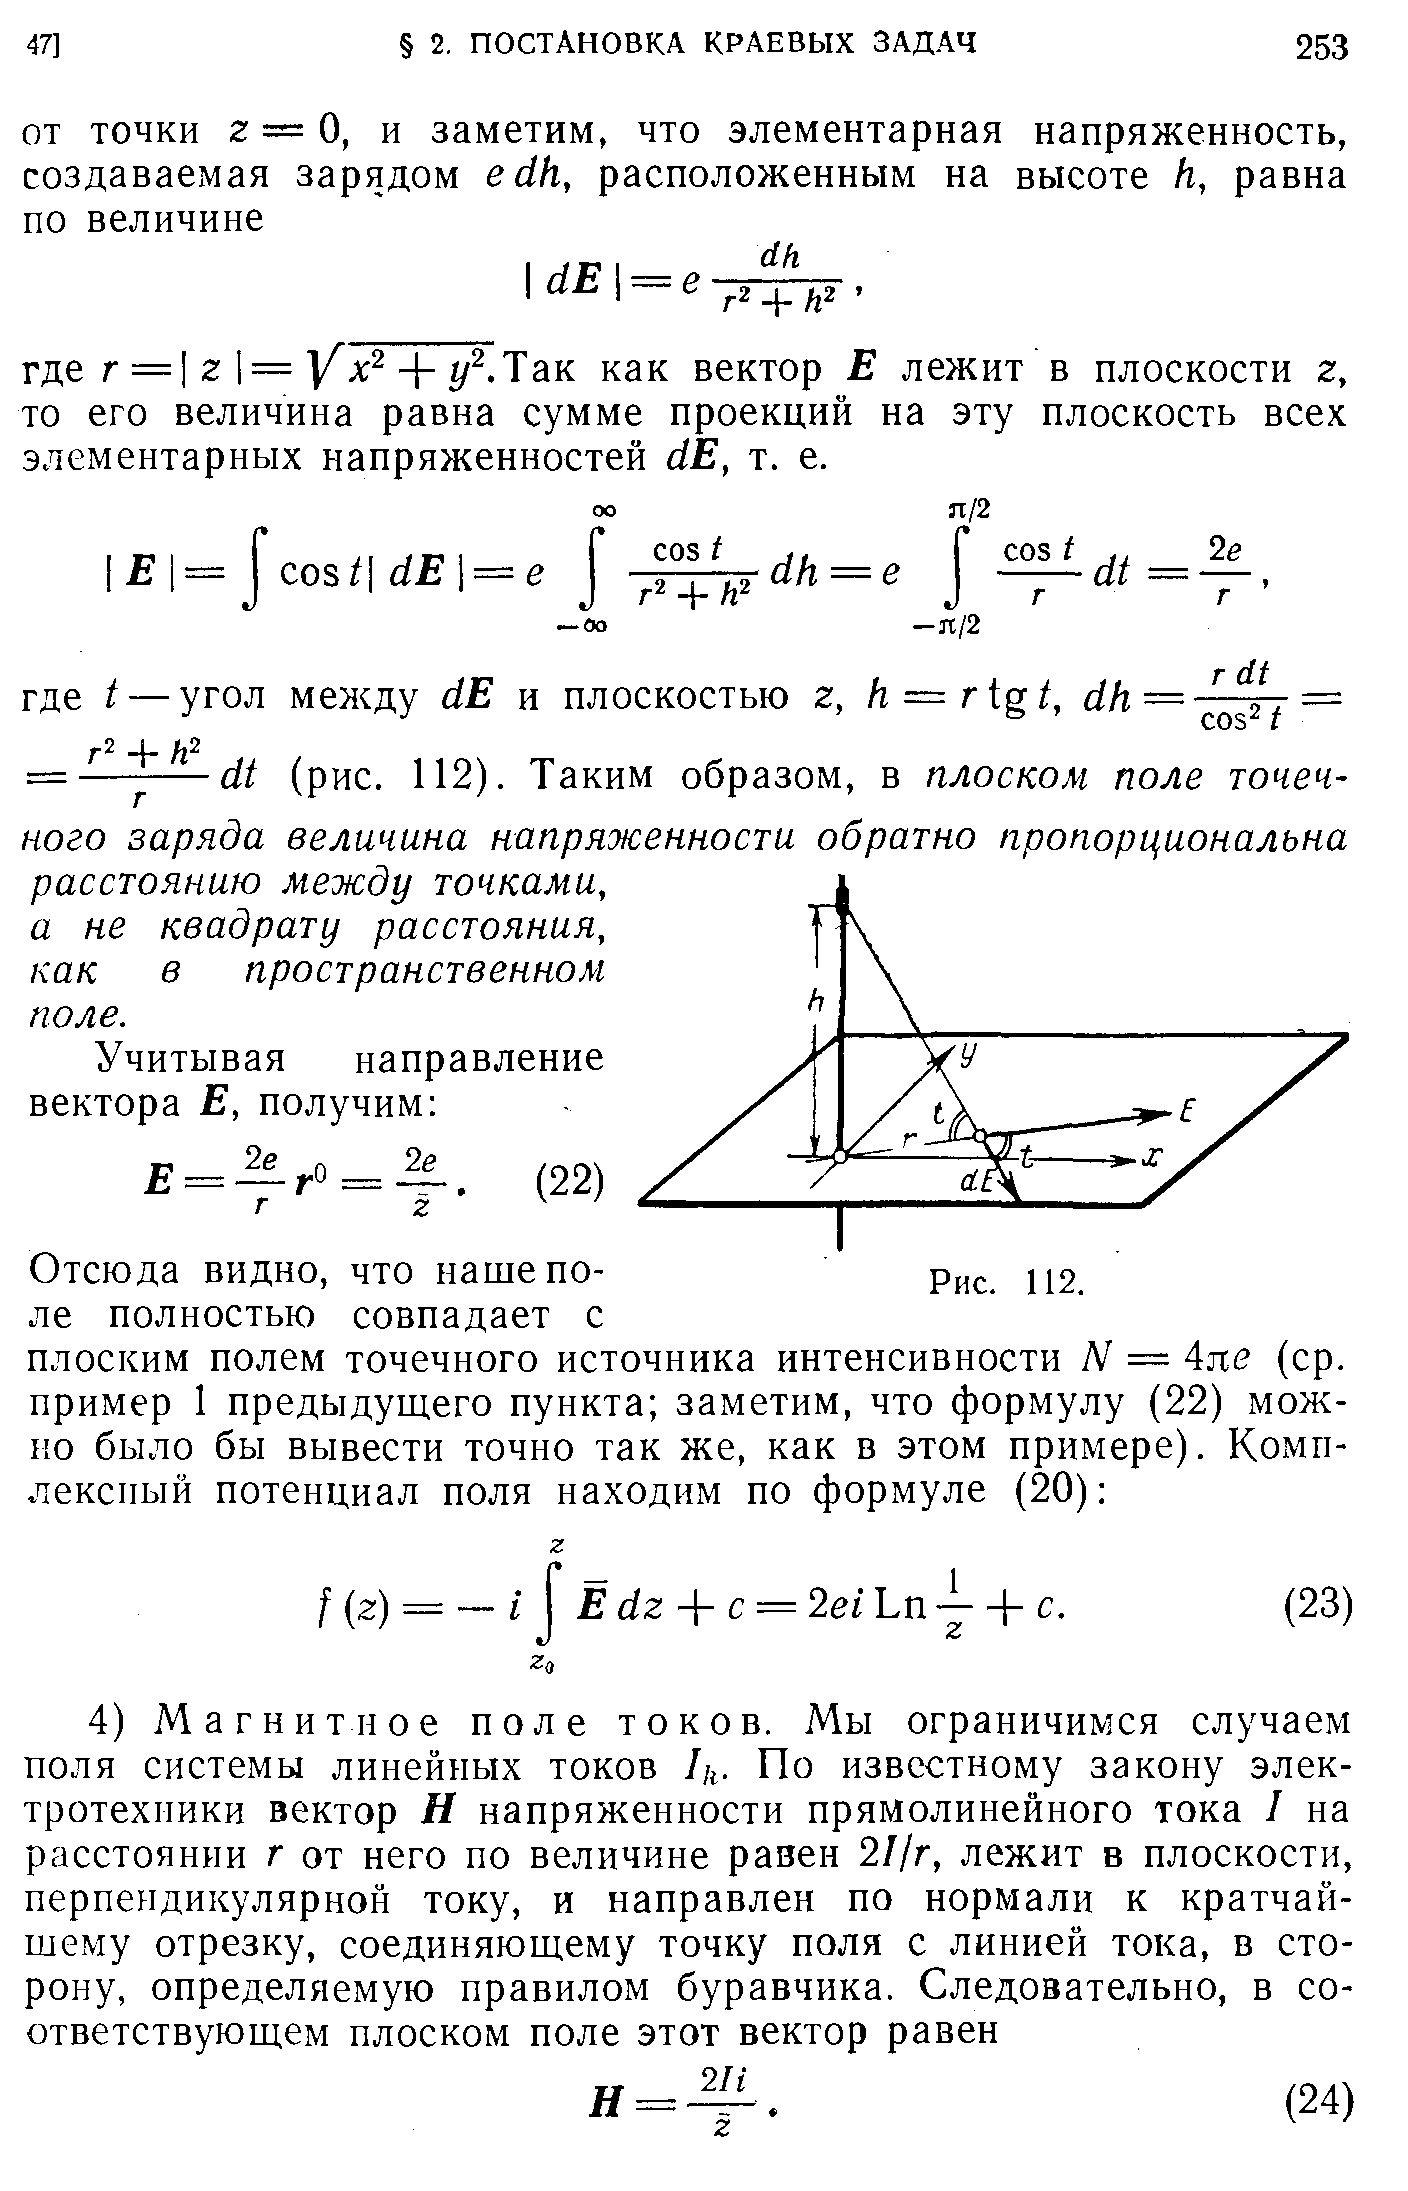 https://i6.imageban.ru/out/2019/11/14/9b438937aa50f8850b3225f50ecaf703.jpg